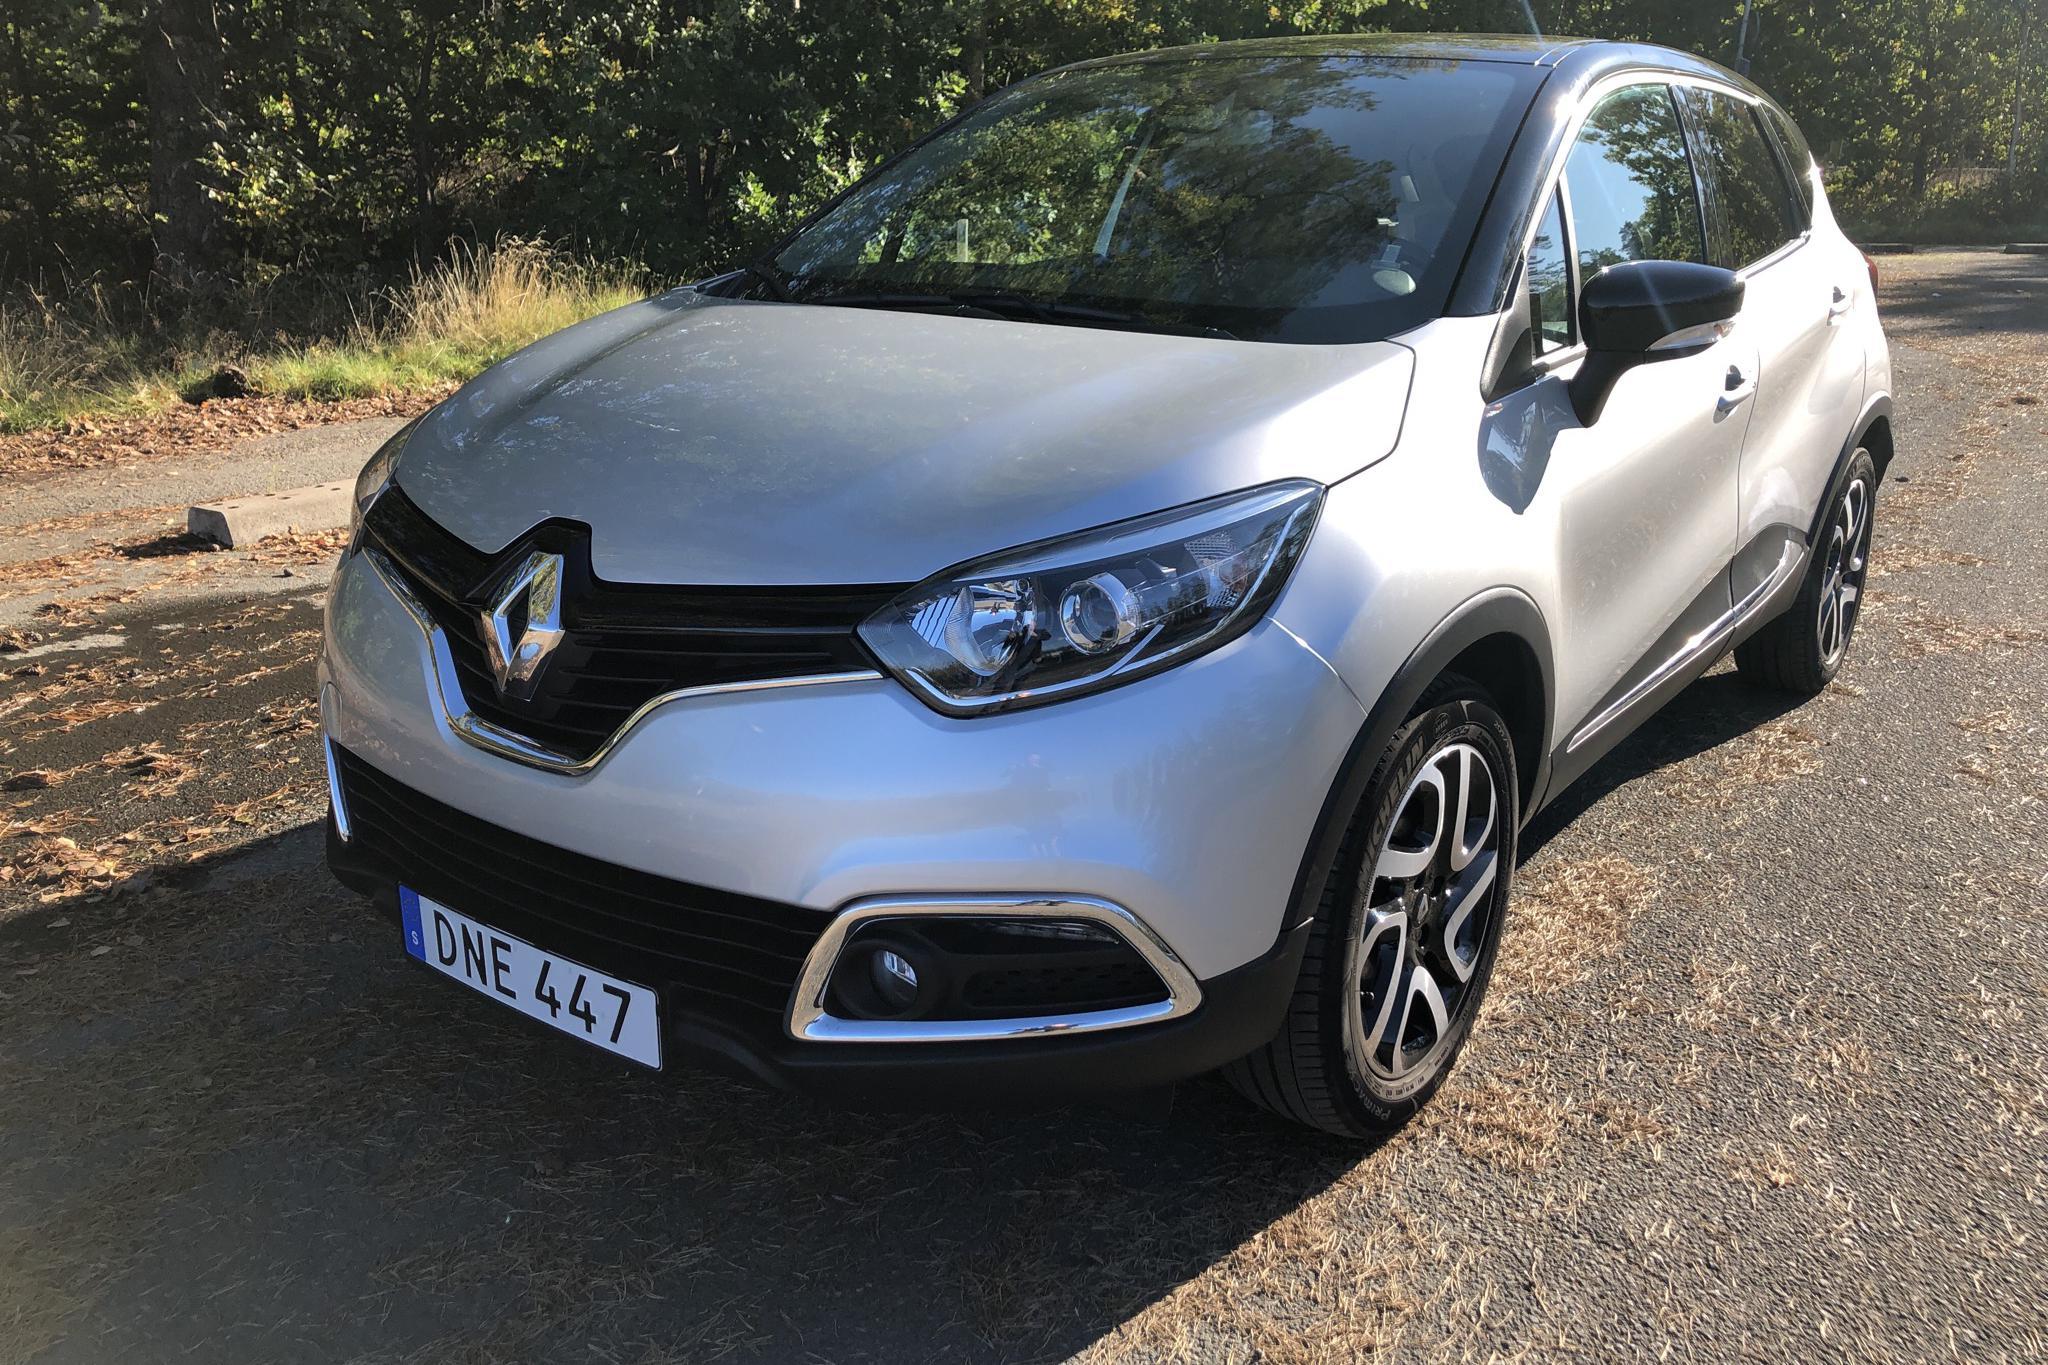 Renault Captur 1.2 TCe (120hk) - 33 000 km - Multicolored - 2016